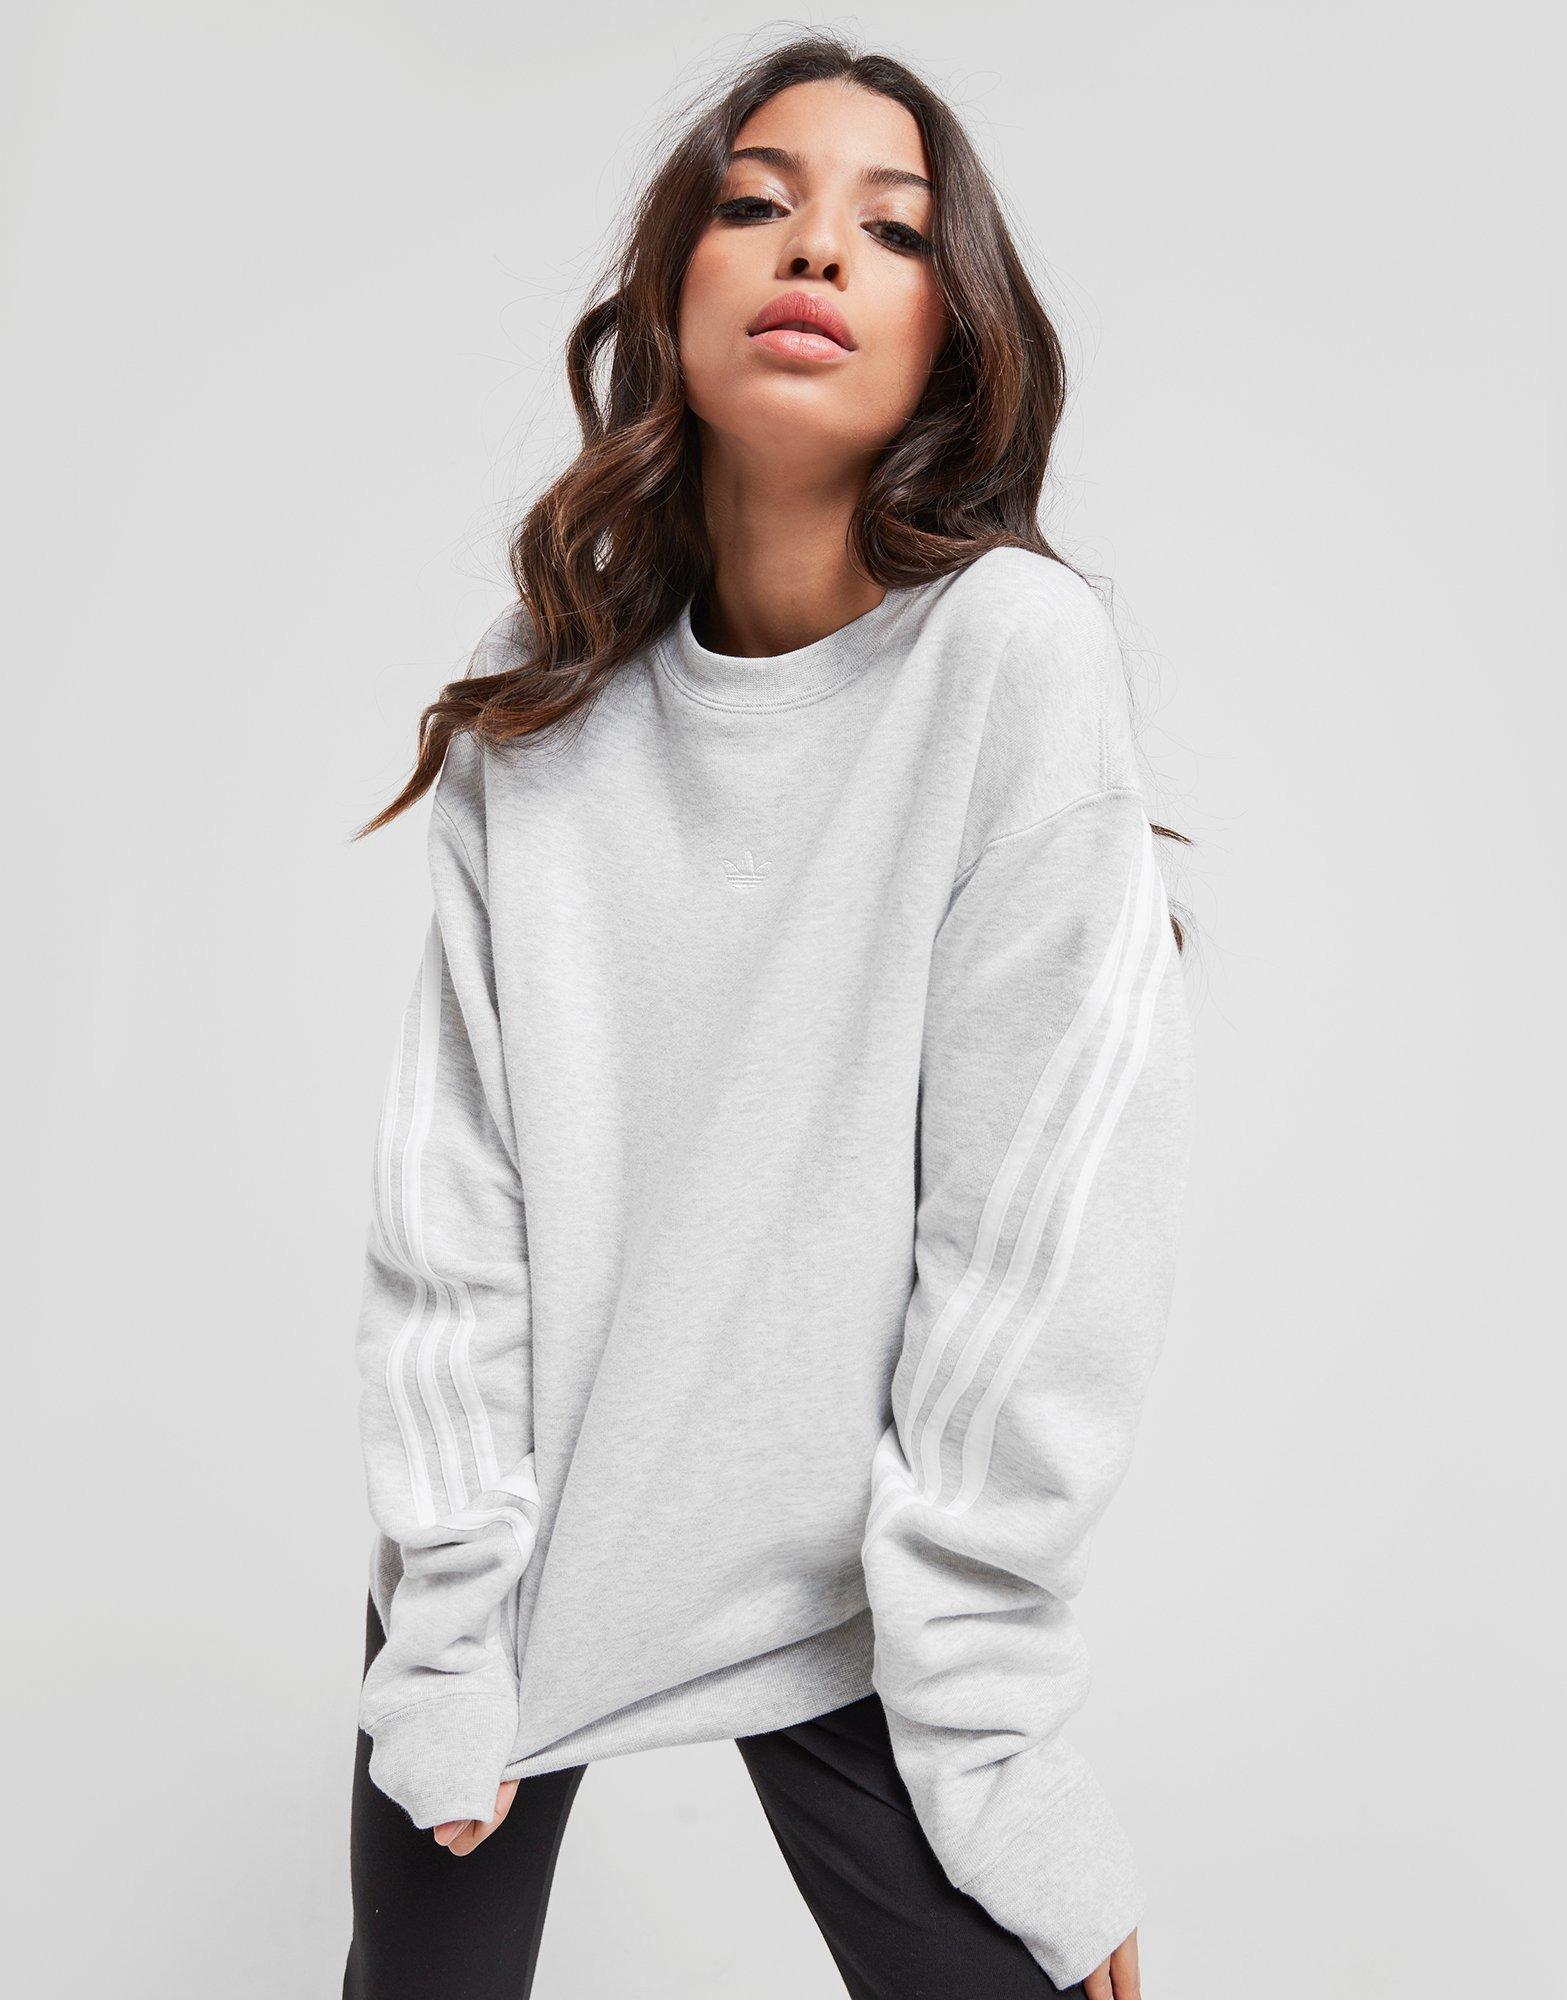 adidas Originals Sweat shirt 3 Stripe Wrap Crew Femme | JD Sports